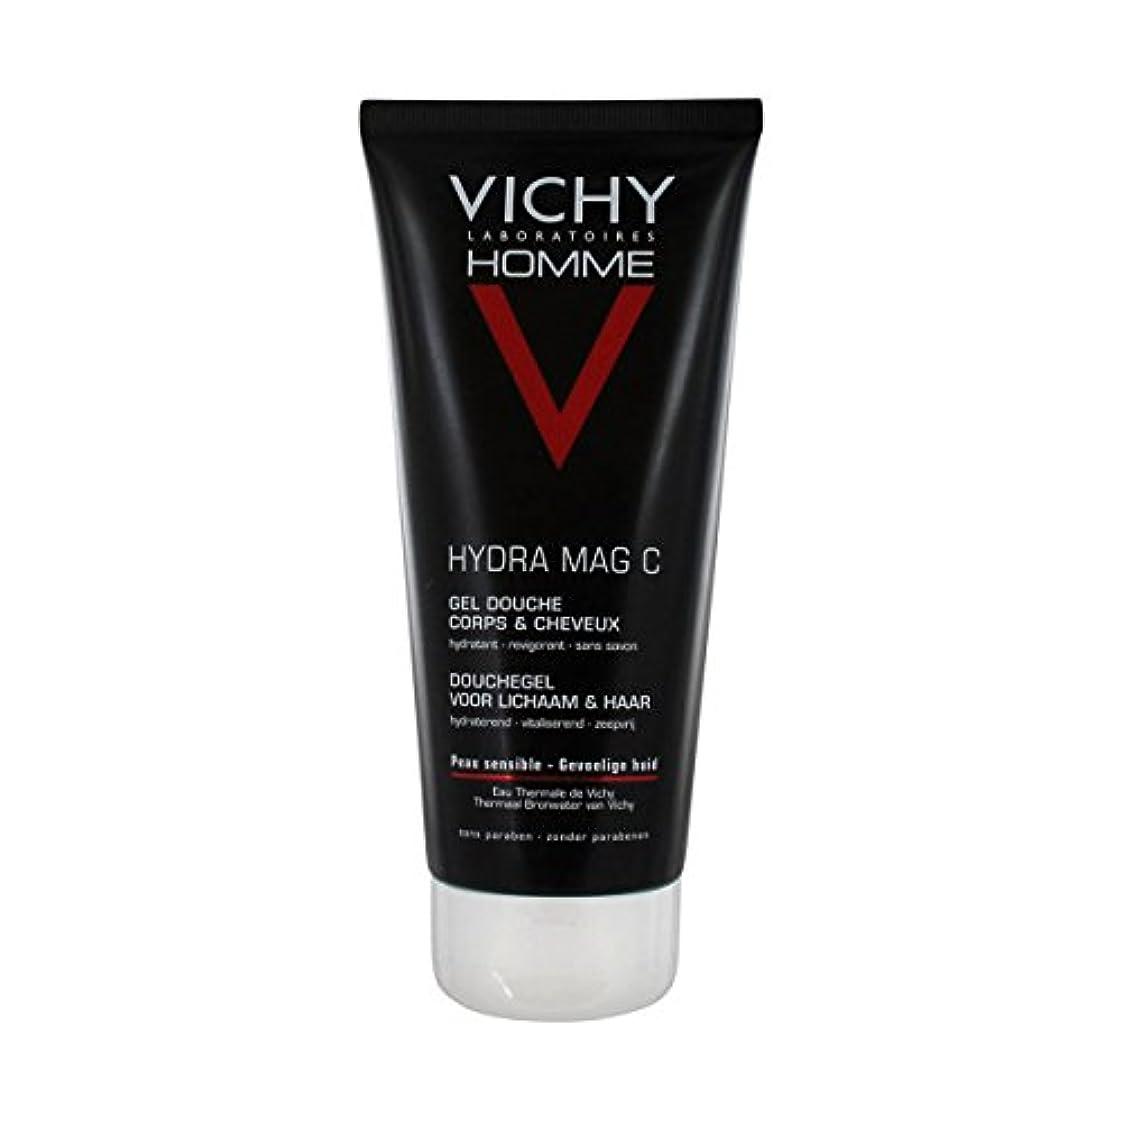 Vichy Homme Hydra Mag-c Shower Gel 200 Ml [並行輸入品]